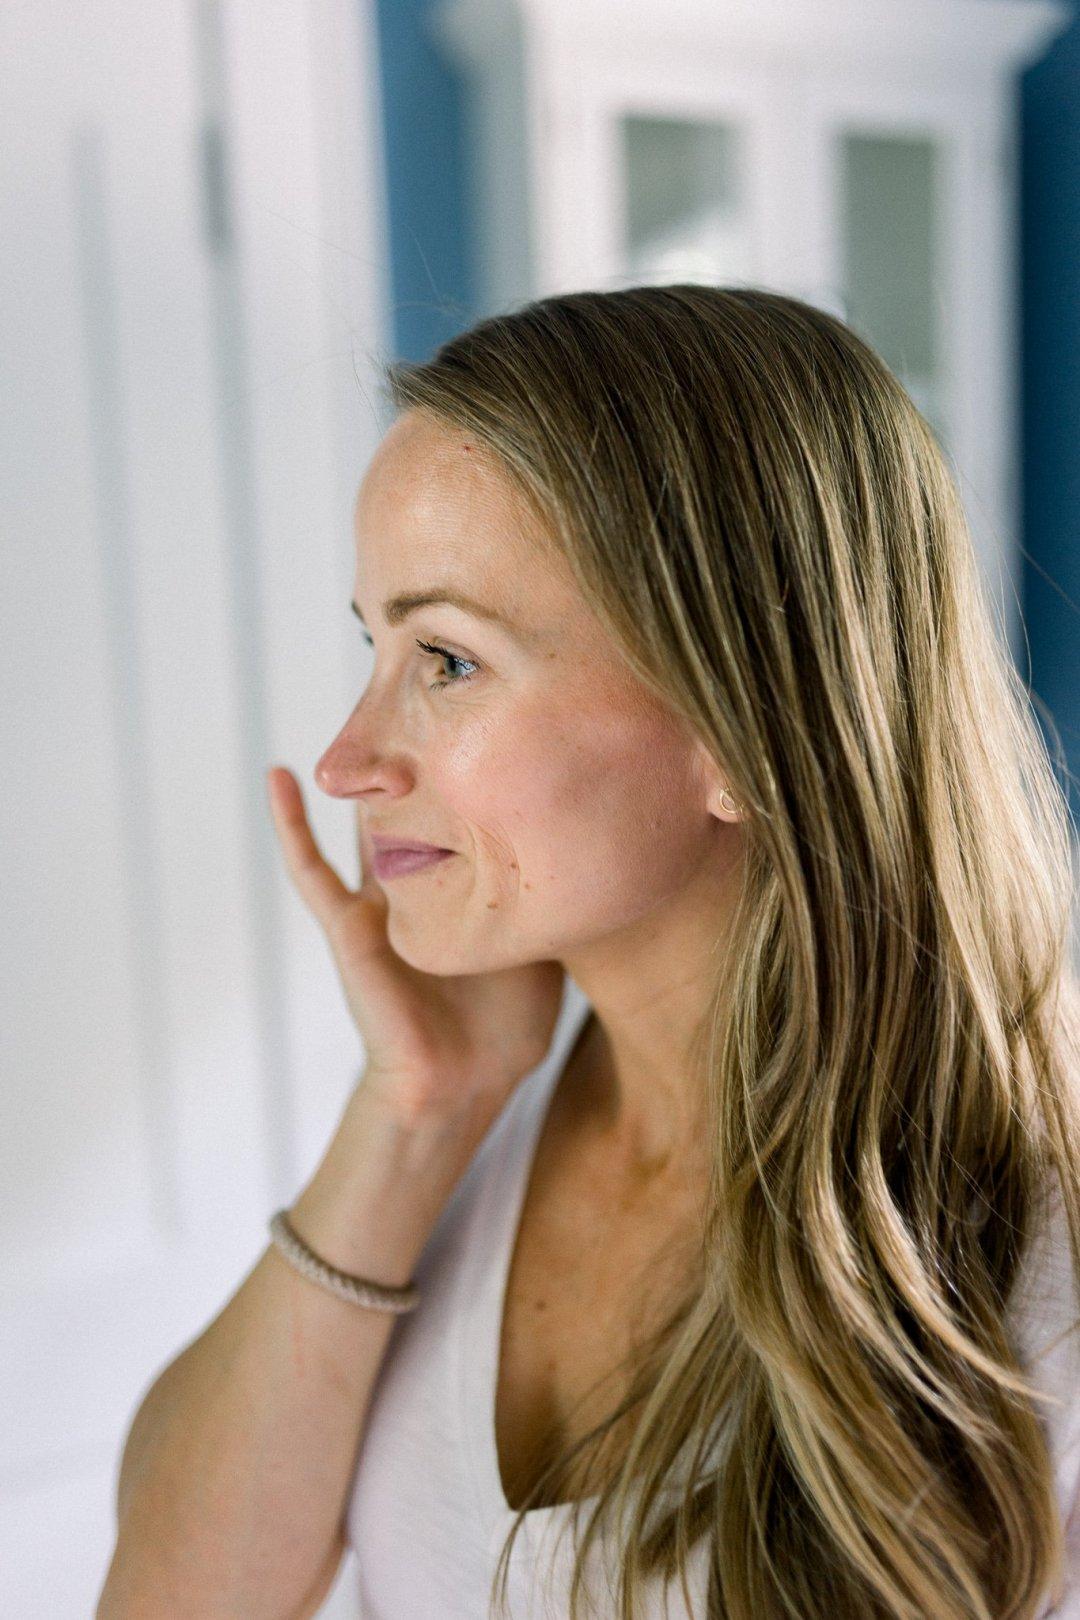 how to apply Beautycounter face sunscreen